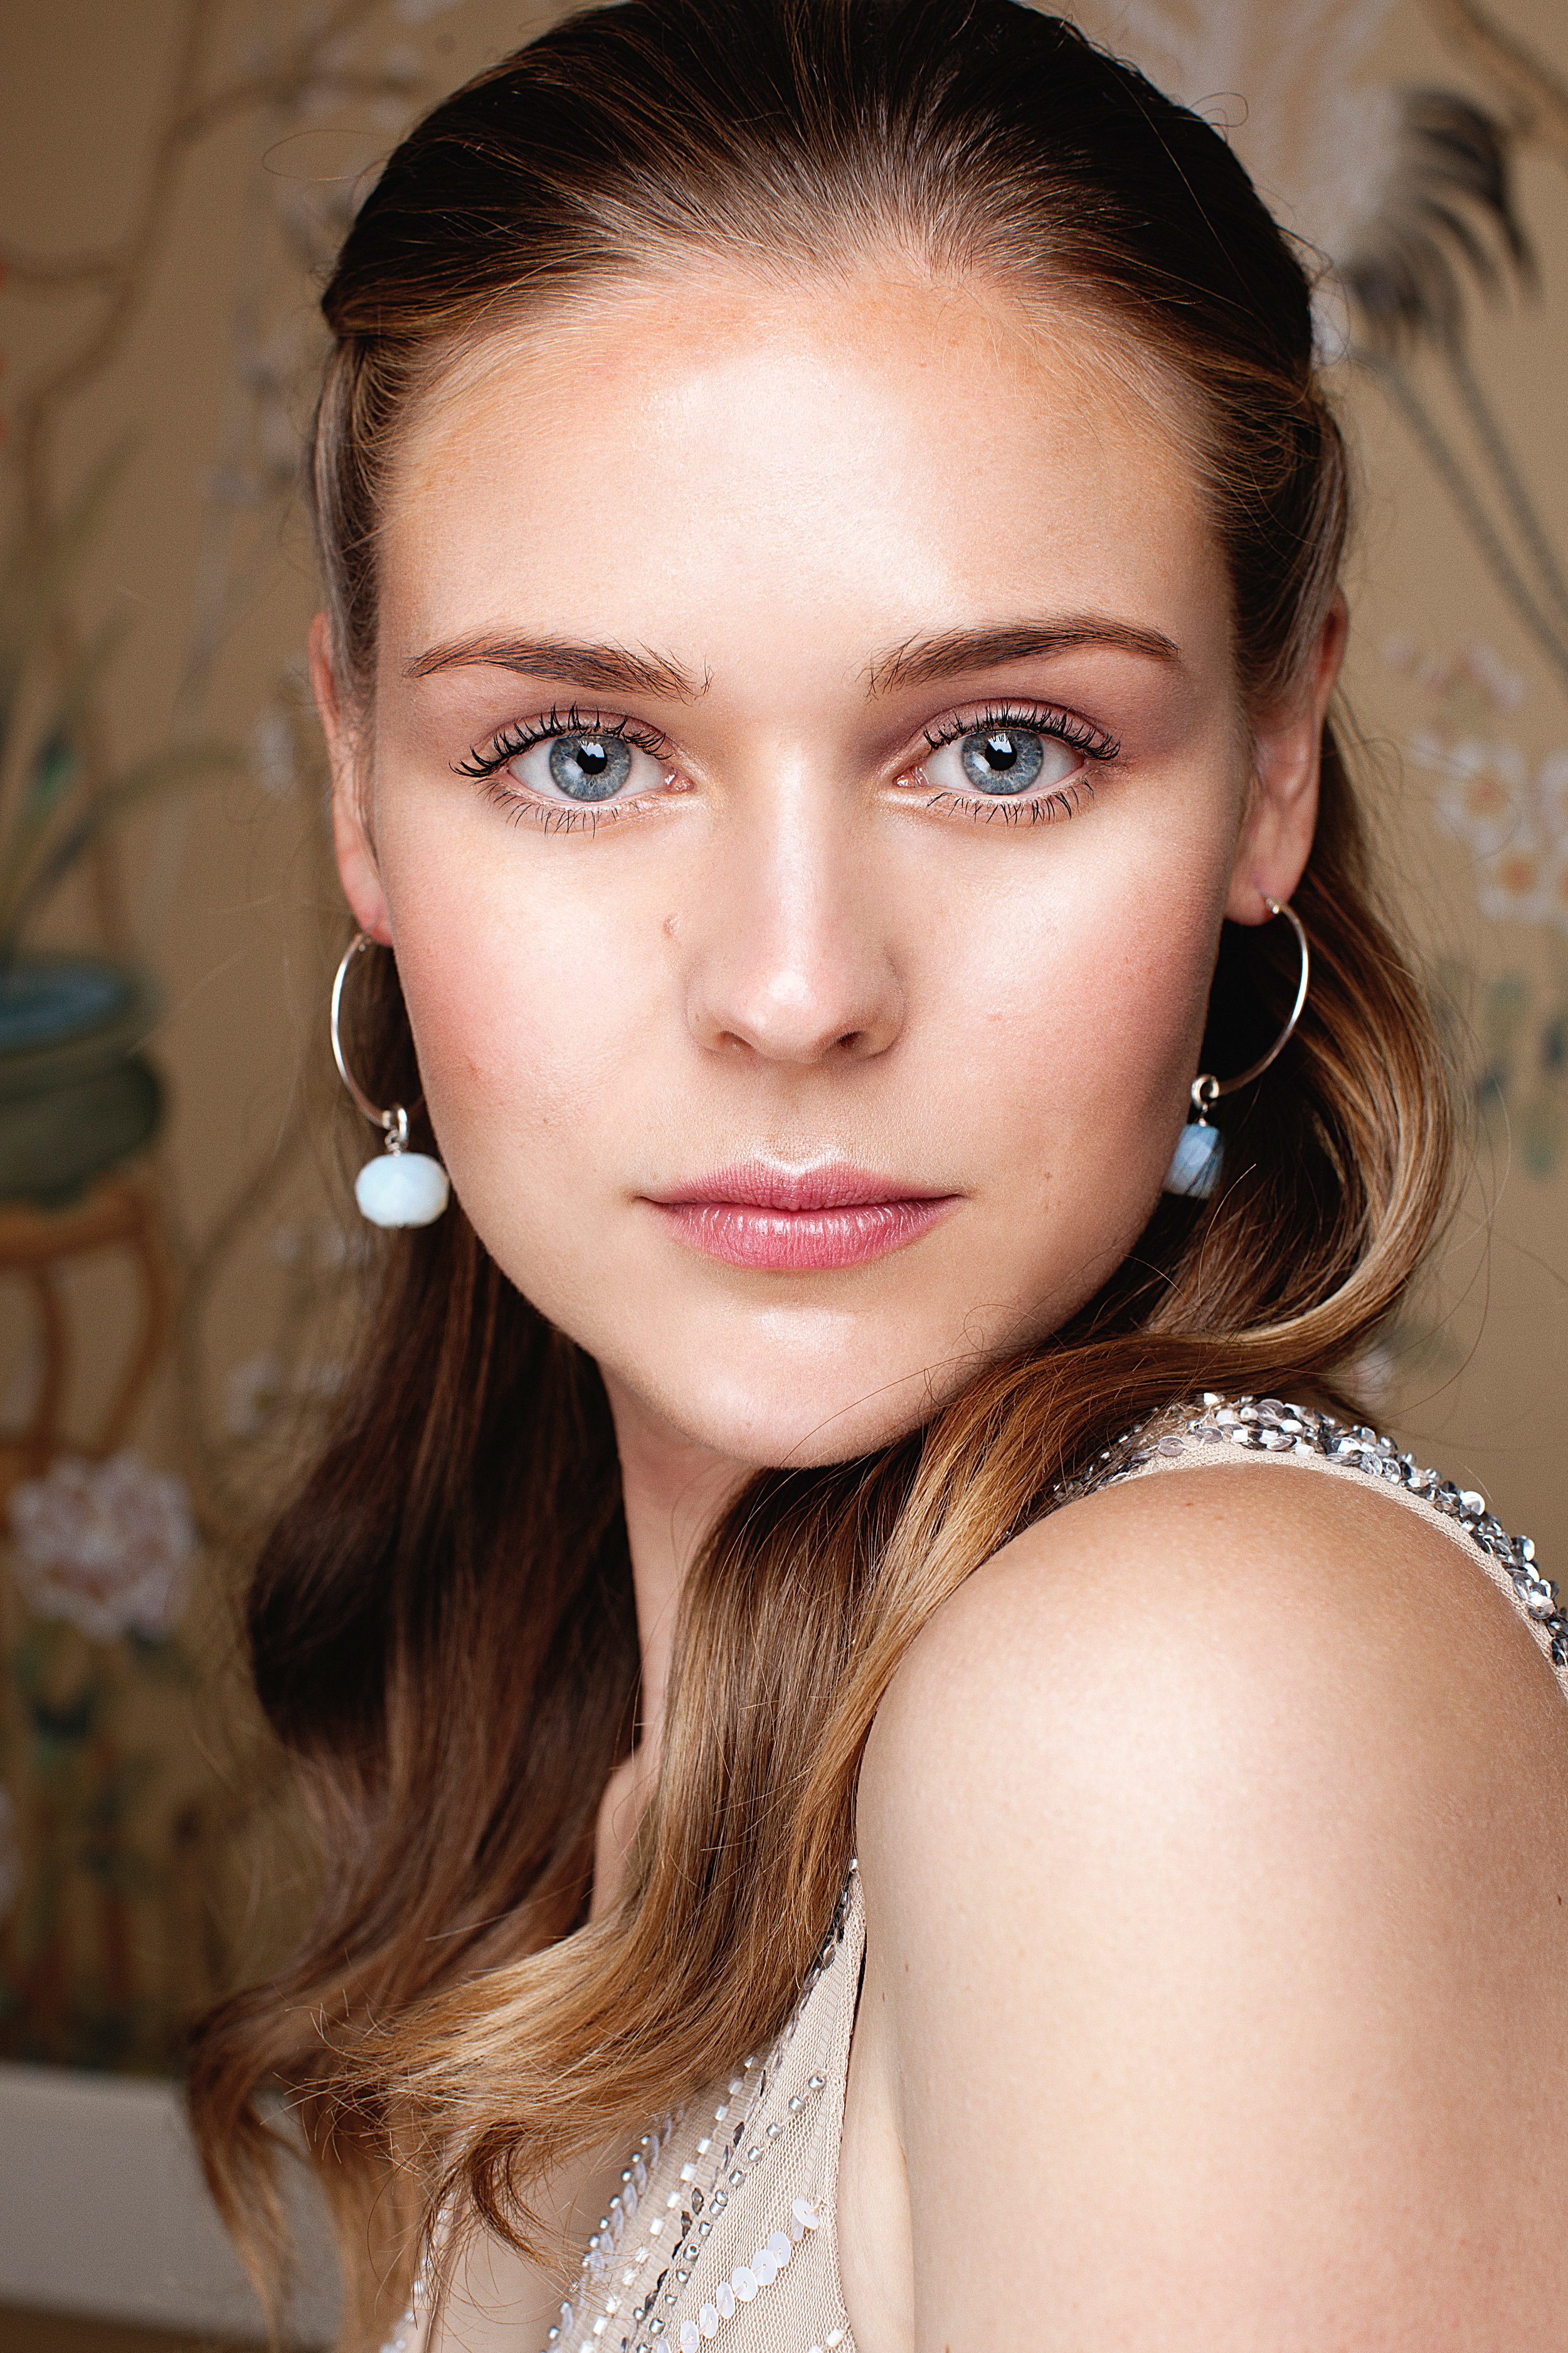 Makeup_Emily_Blownaway1.jpg